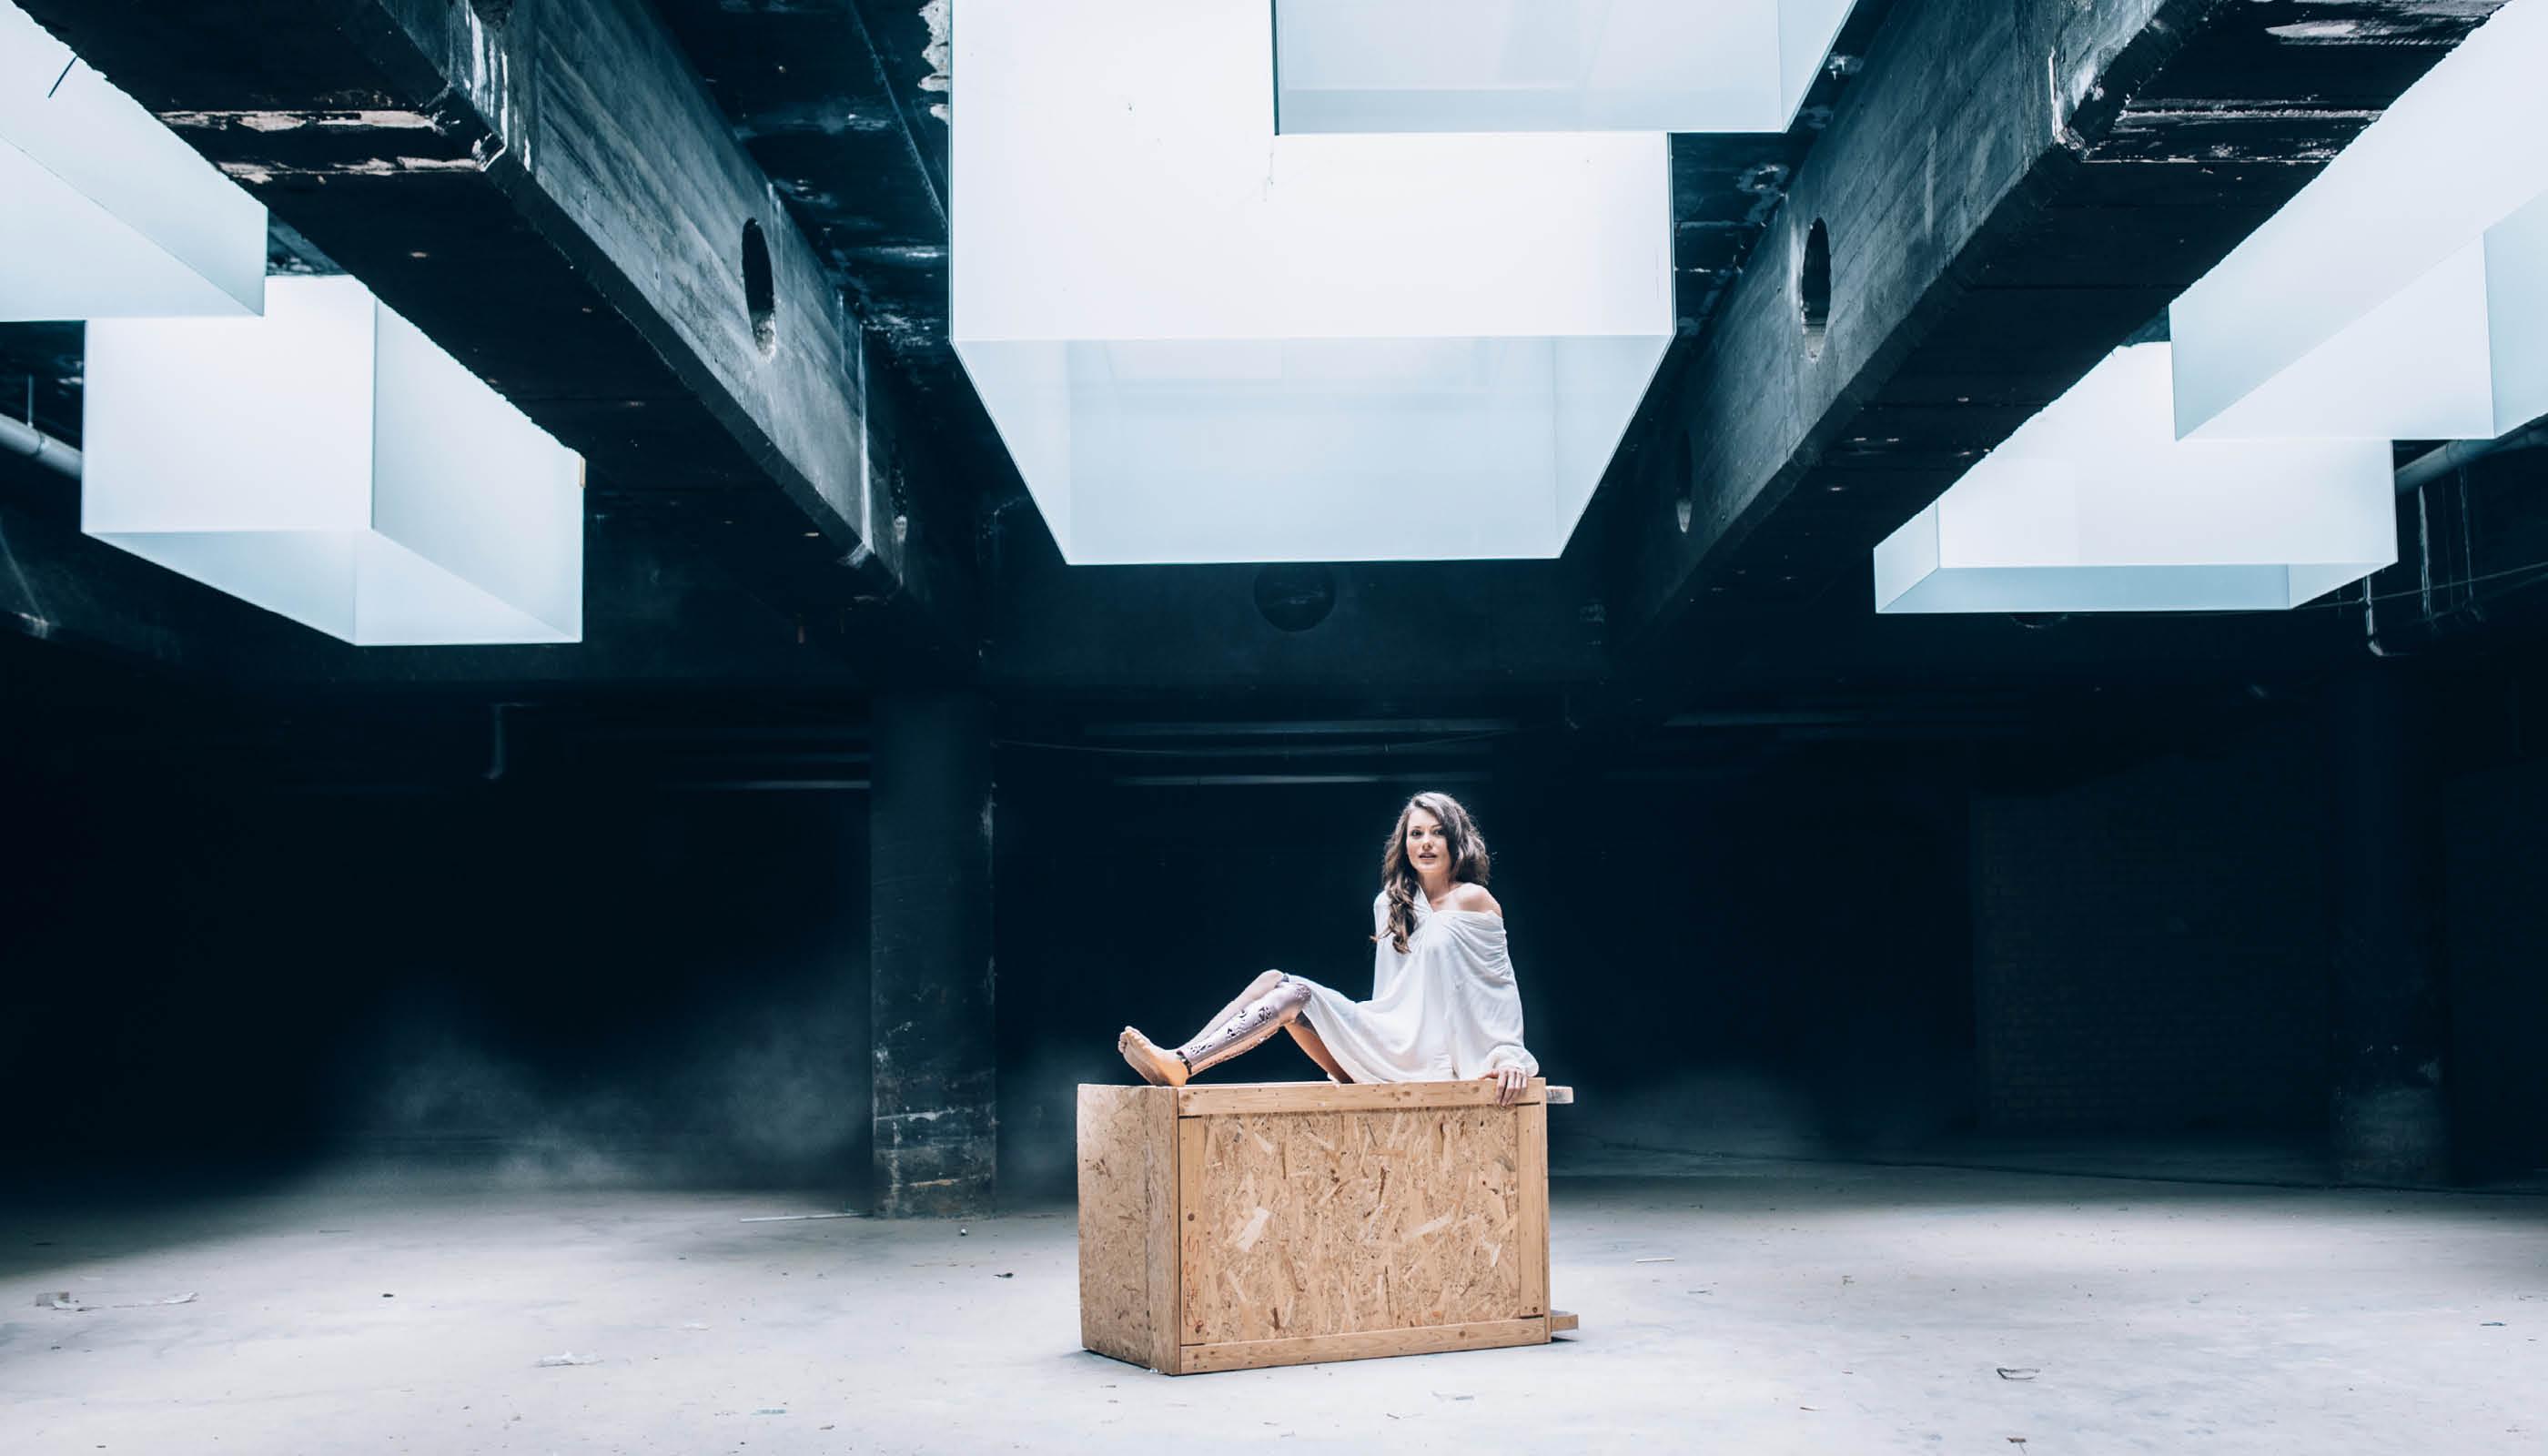 unyq_seville_shoot_2019_01